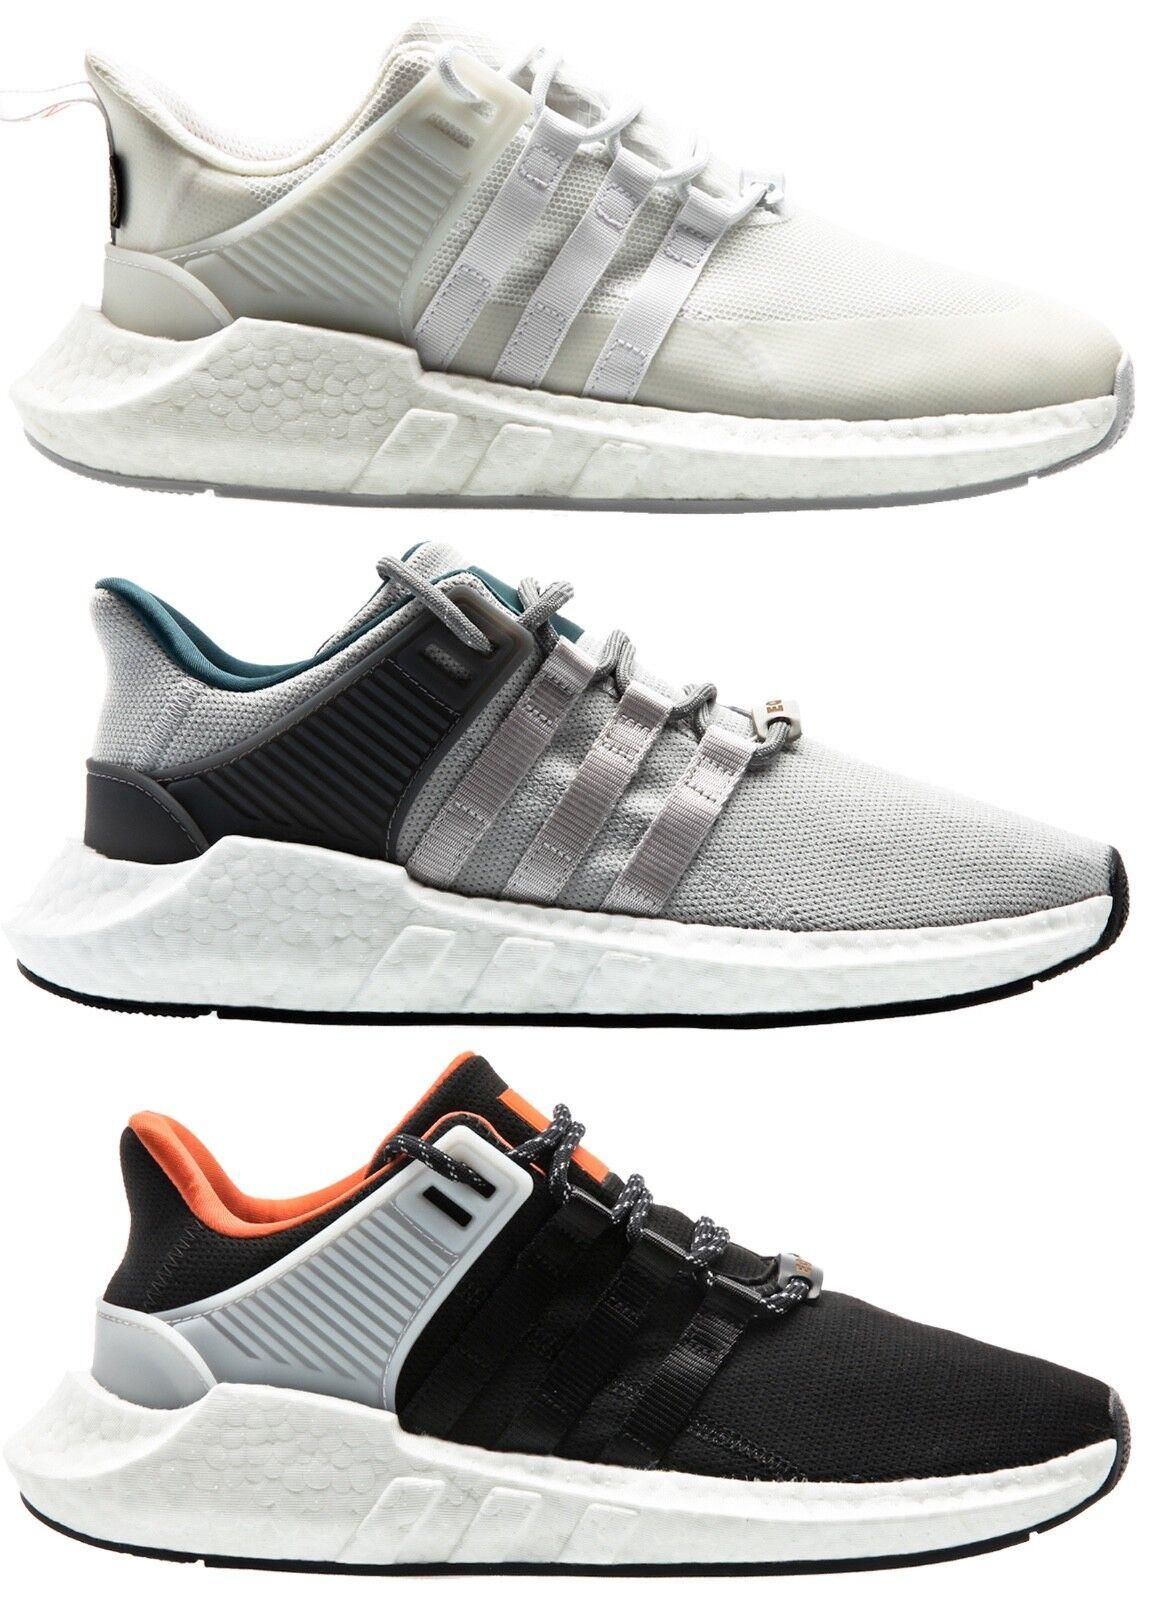 Adidas Originals EQT Equipment Support 93/17 Welding Pack Men Sneaker